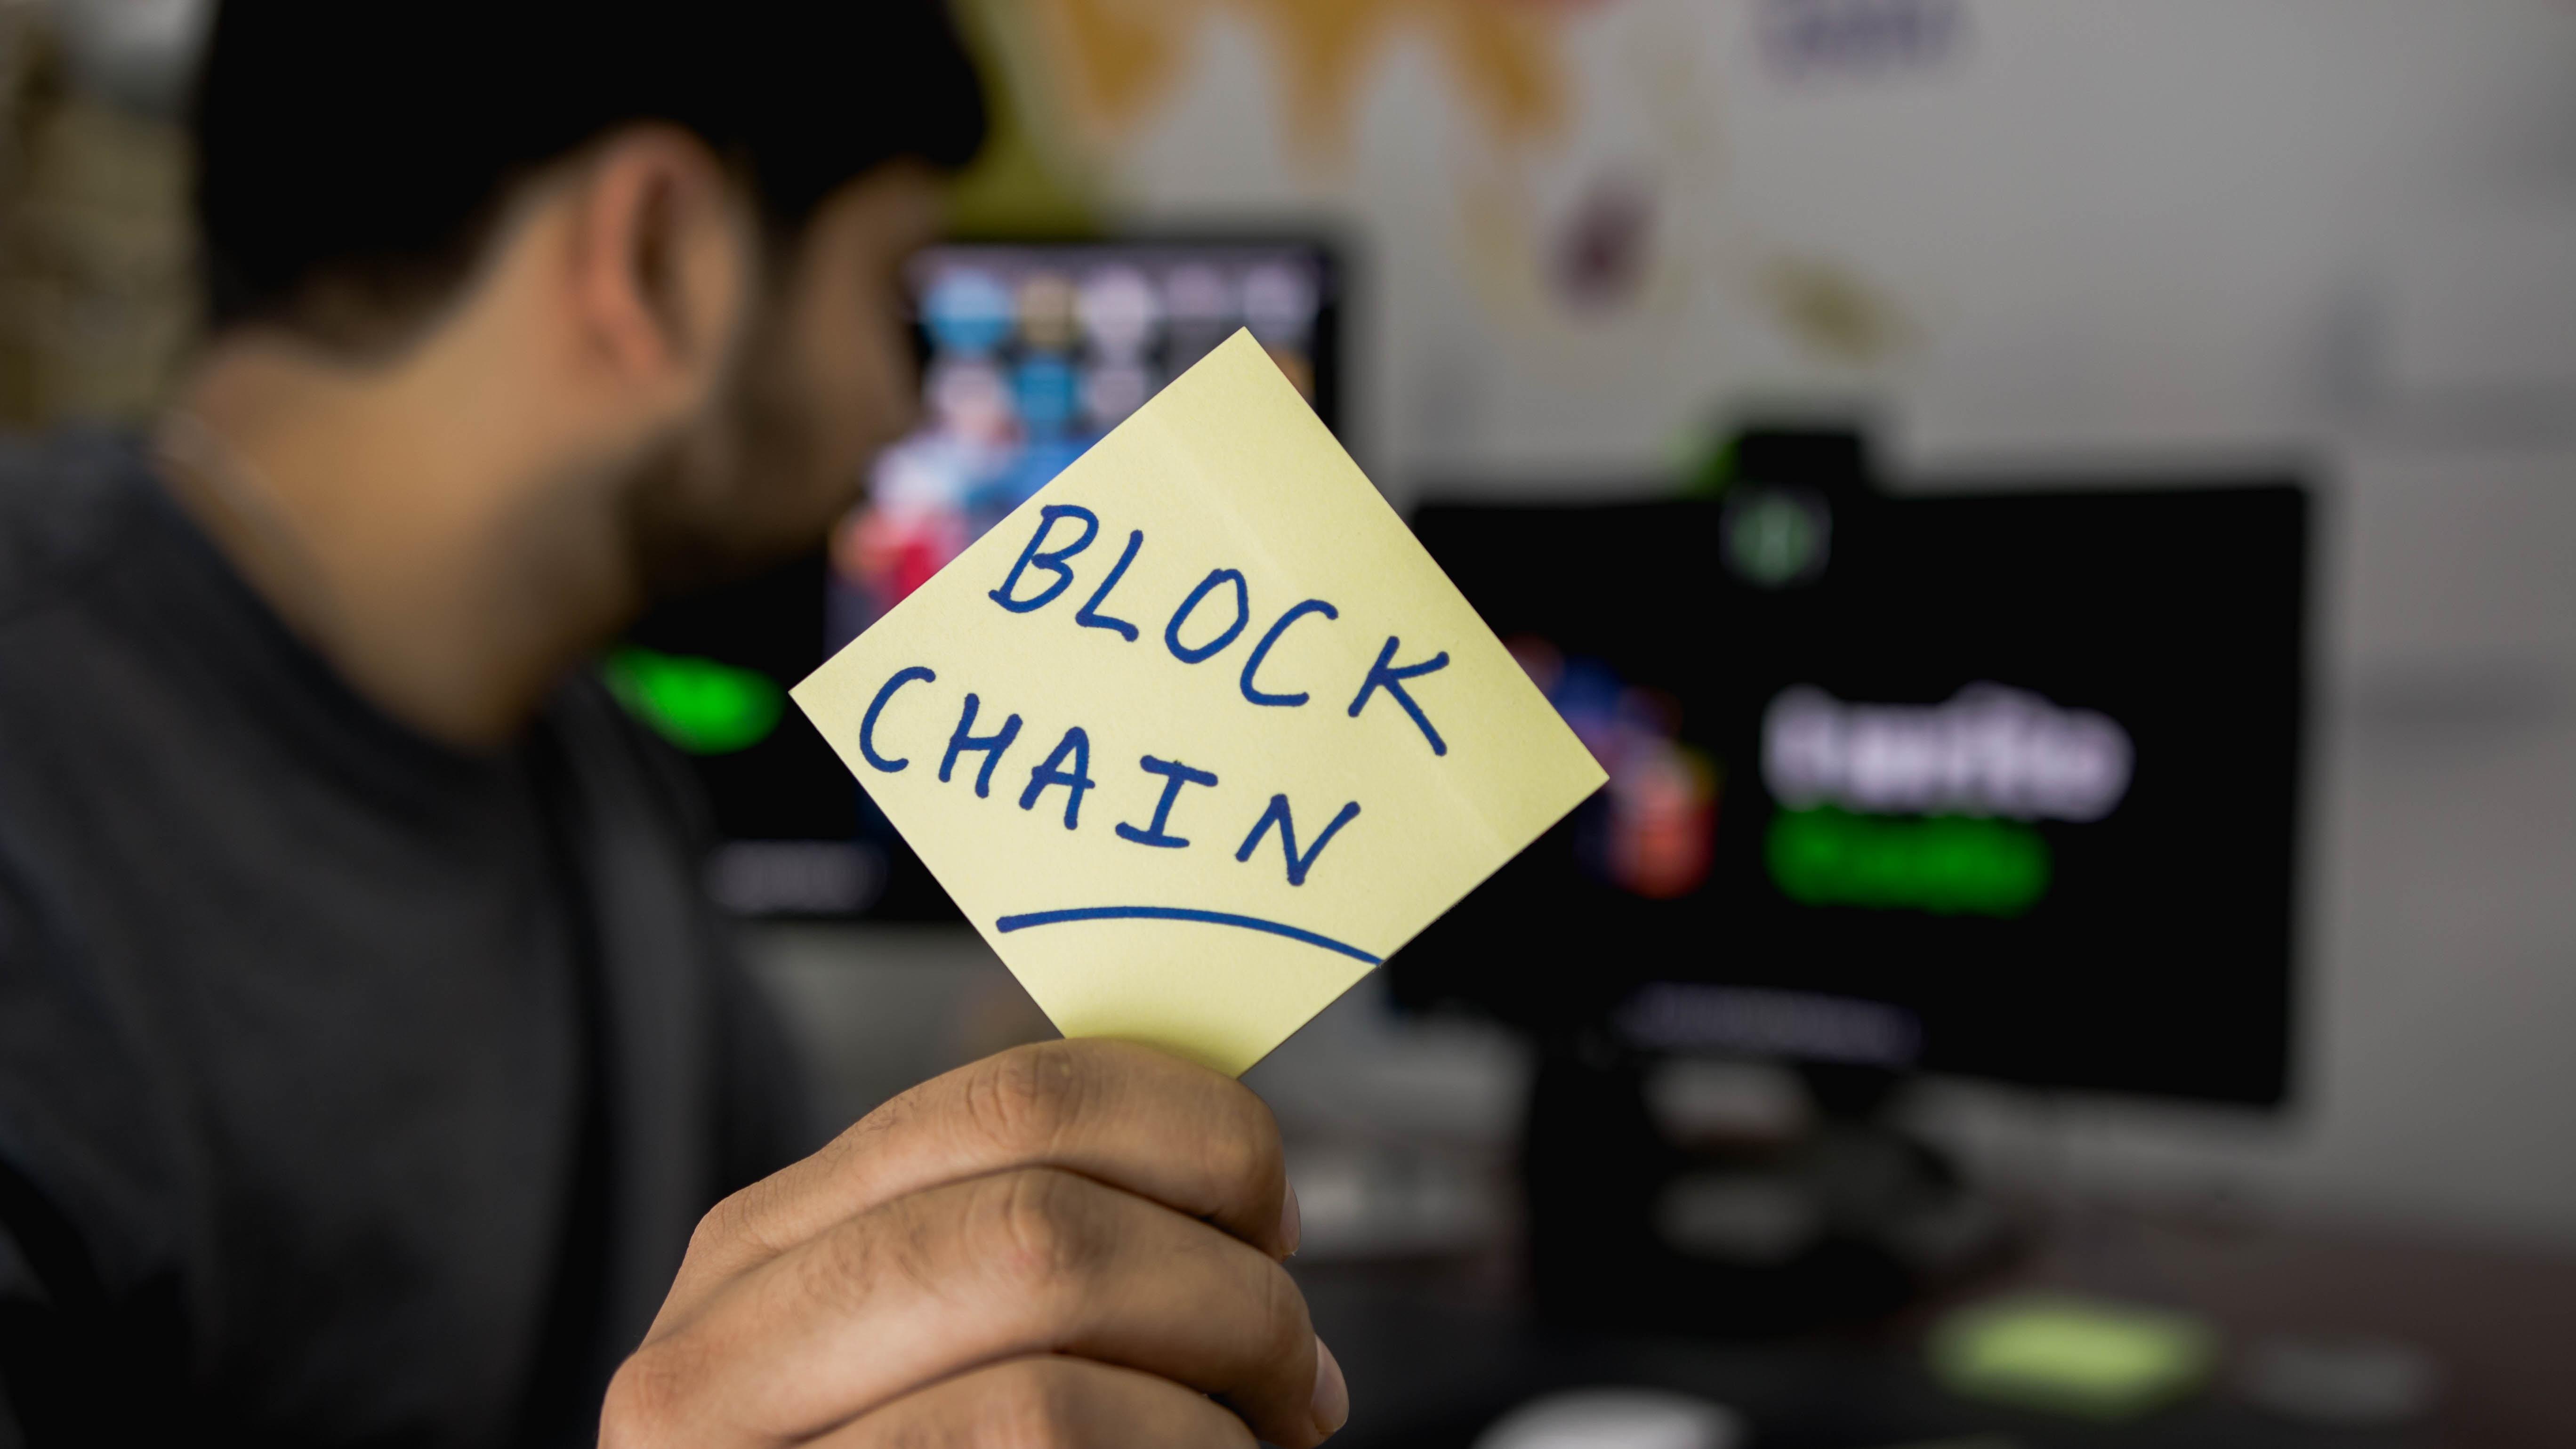 Blockchain Jobs Bitcoin Technology Crypto Image